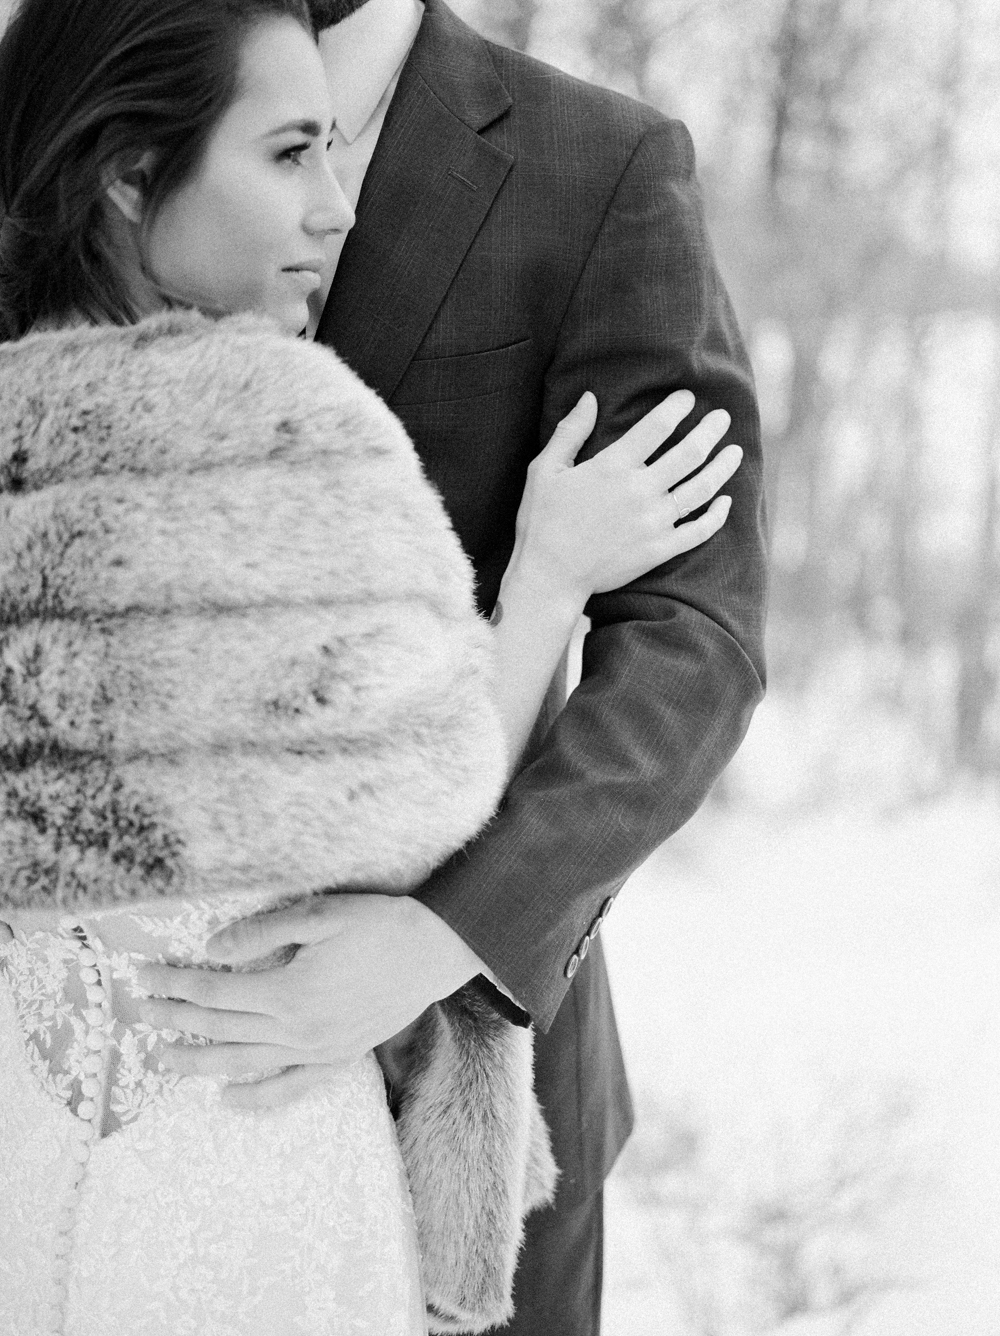 Christine-Gosch-Utah-film-photographer-wedding-mountains-snow-snowy-destination-5.jpg